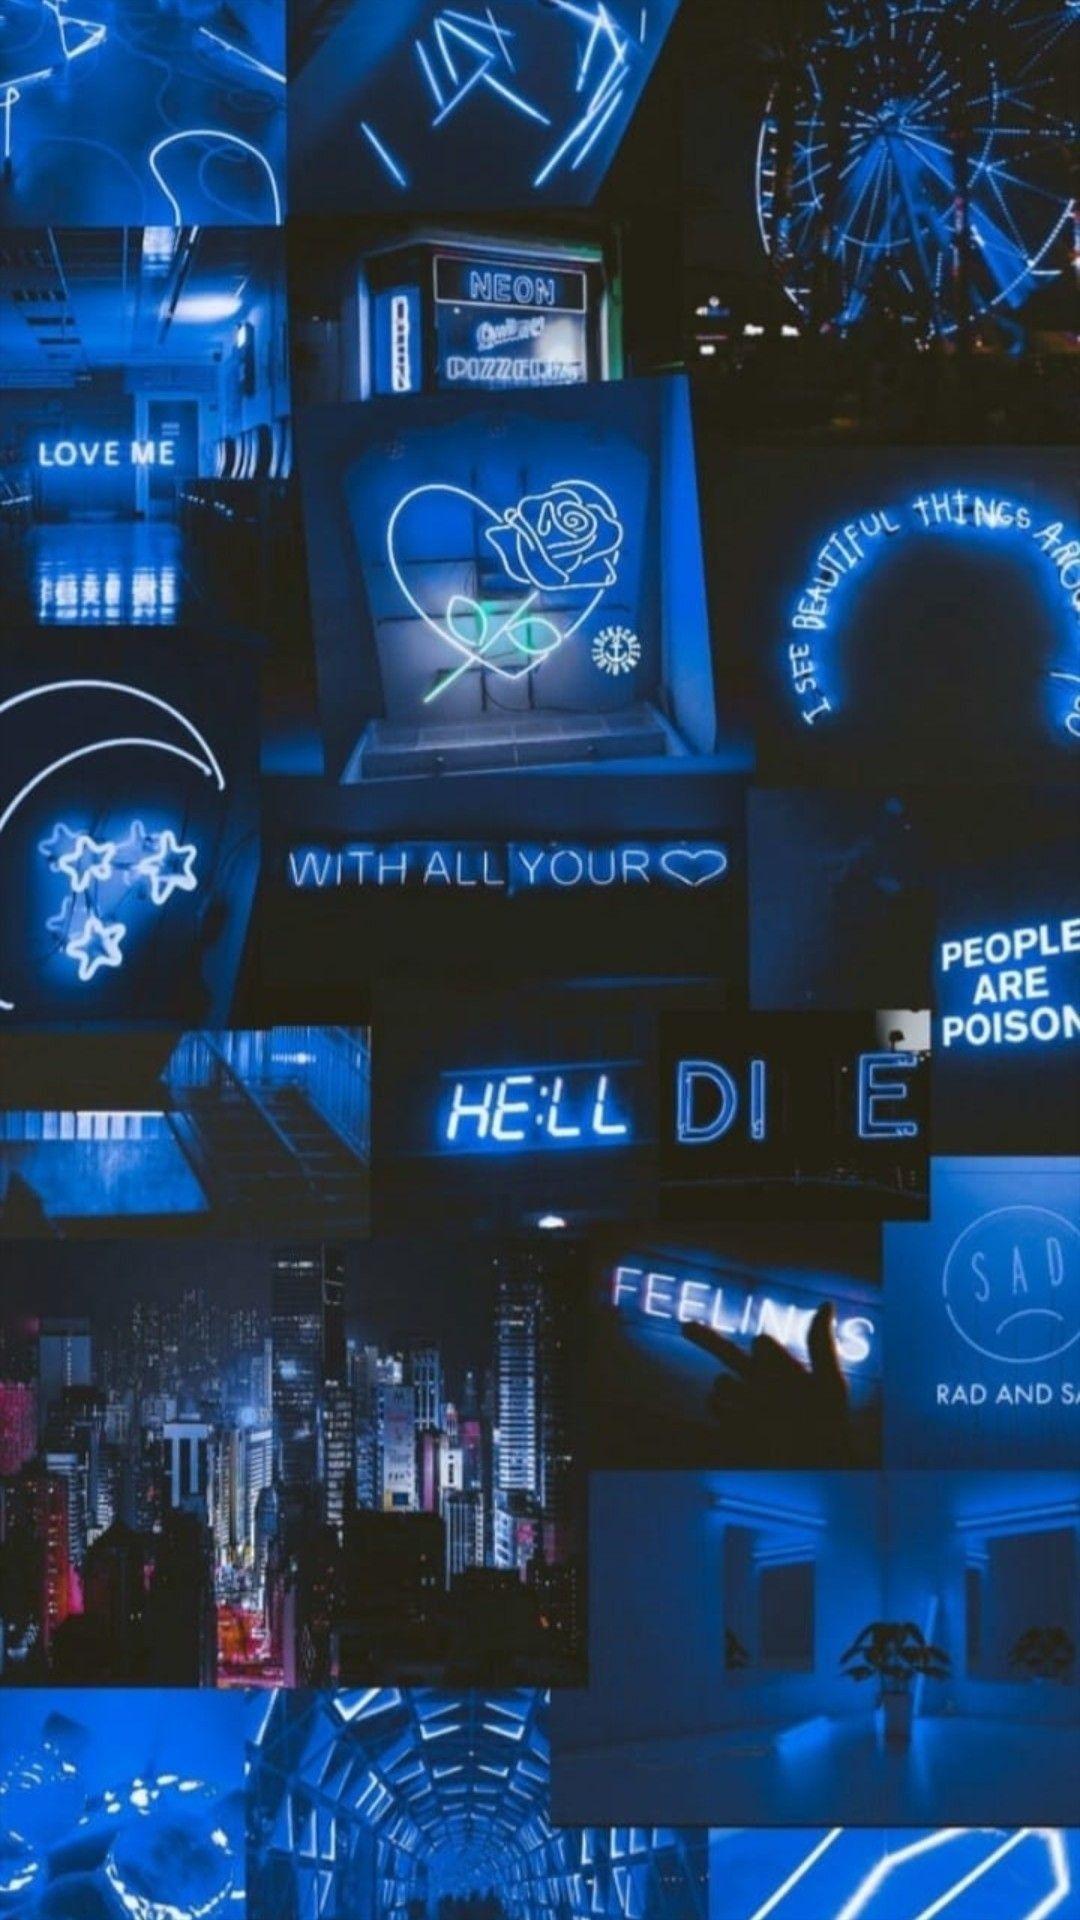 Collage Wallpaper Blueaesthetic Blue Aesthetic Vintage Blue Wallpaper Aesth In 2020 Blue Wallpaper Iphone Aesthetic Pastel Wallpaper Black Aesthetic Wallpaper